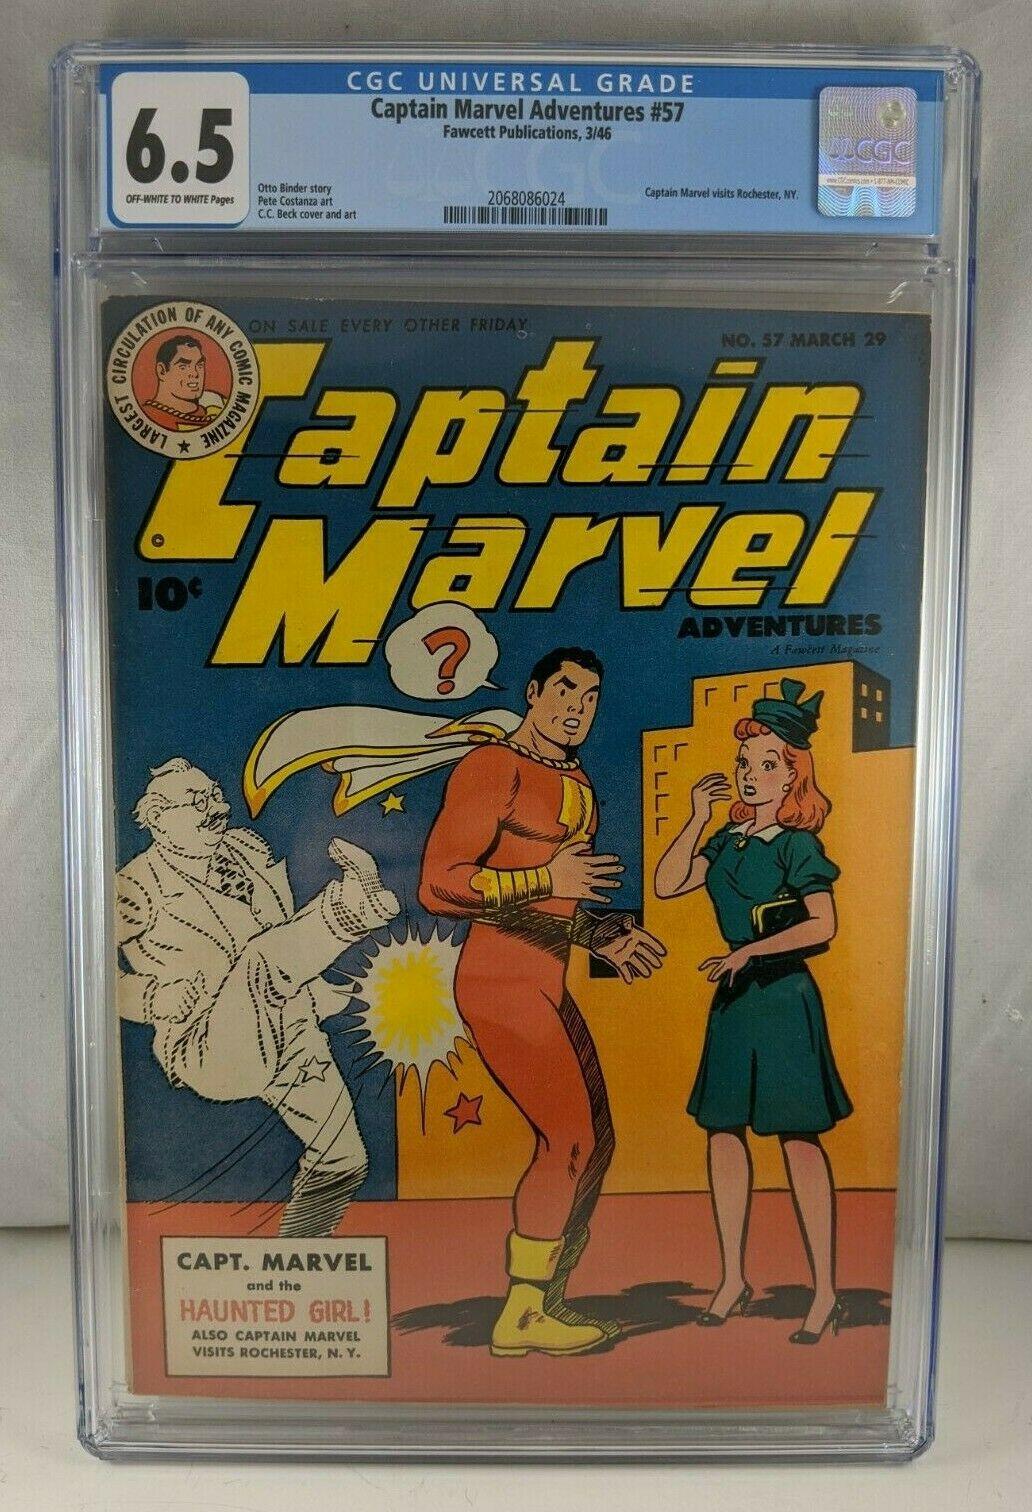 Captain Marvel Adventures #57 1946 [CGC 6.5] Golden Age Shazam Visits Rochester